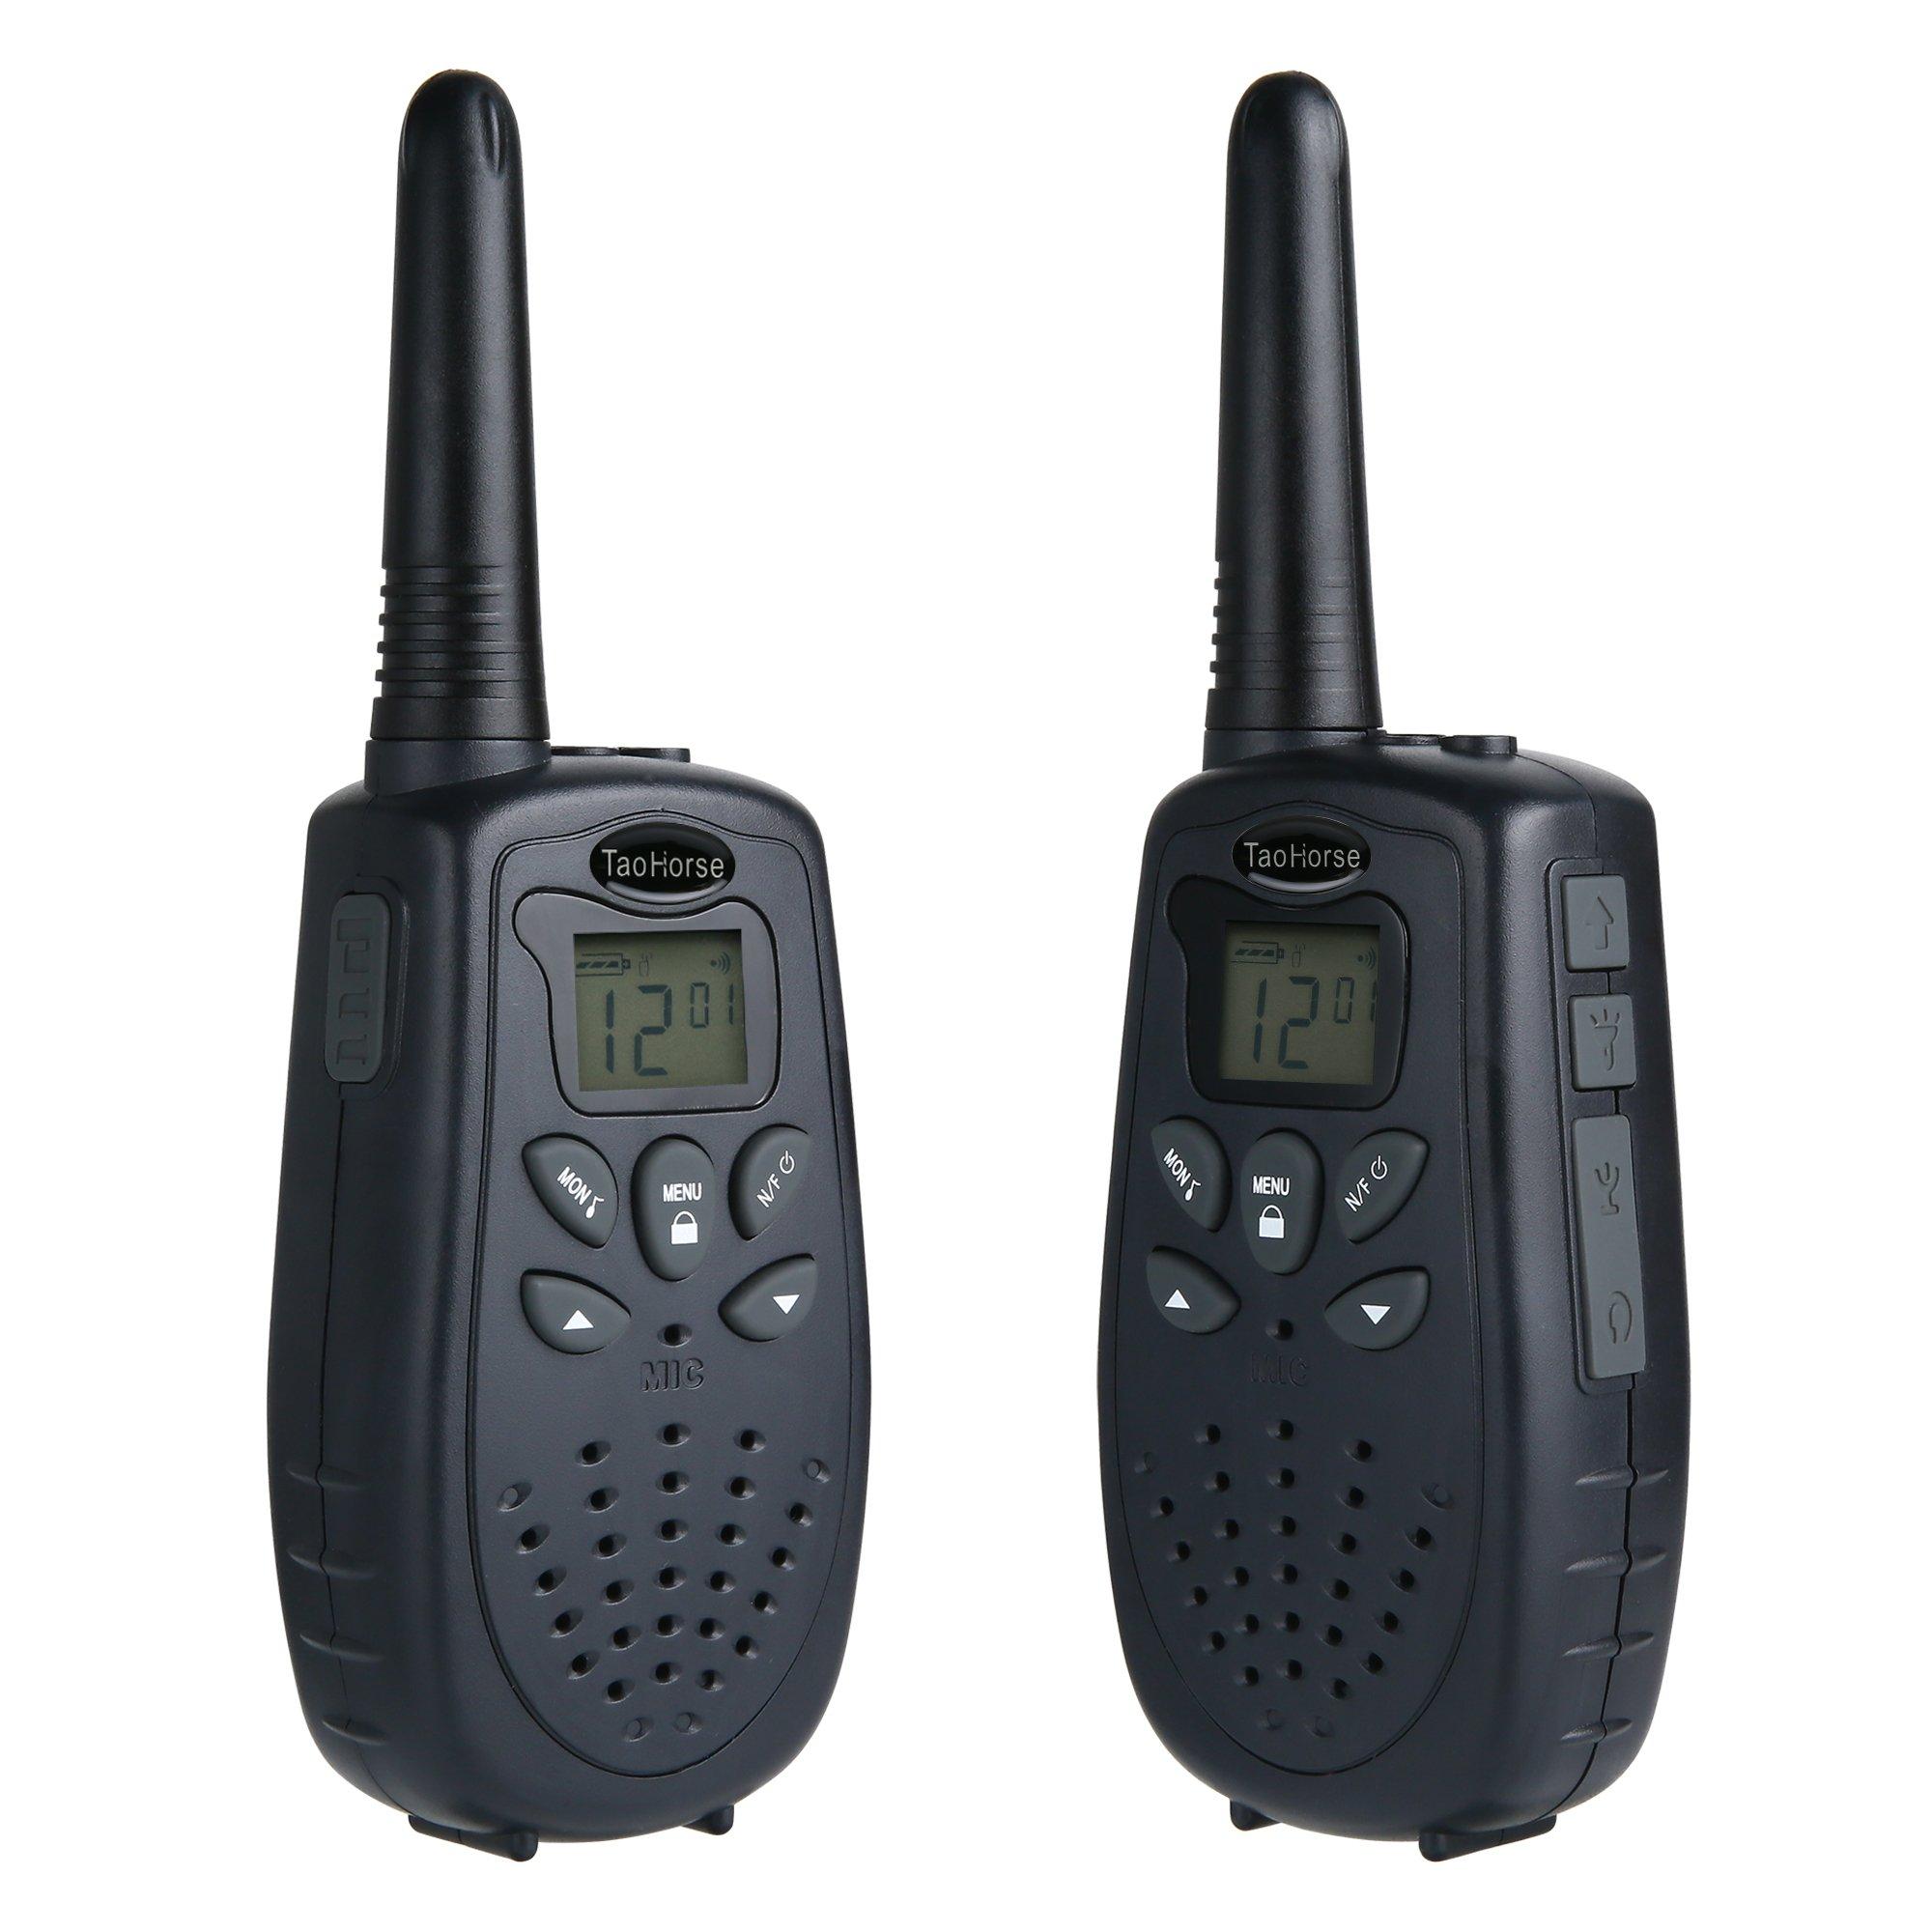 TaoHorse Walkie Talkies Long Range VOX UHF 22 Channel Handheld Two Way Radios for Travel Hiking Hunting Outdoor Adventures, 2 Pack